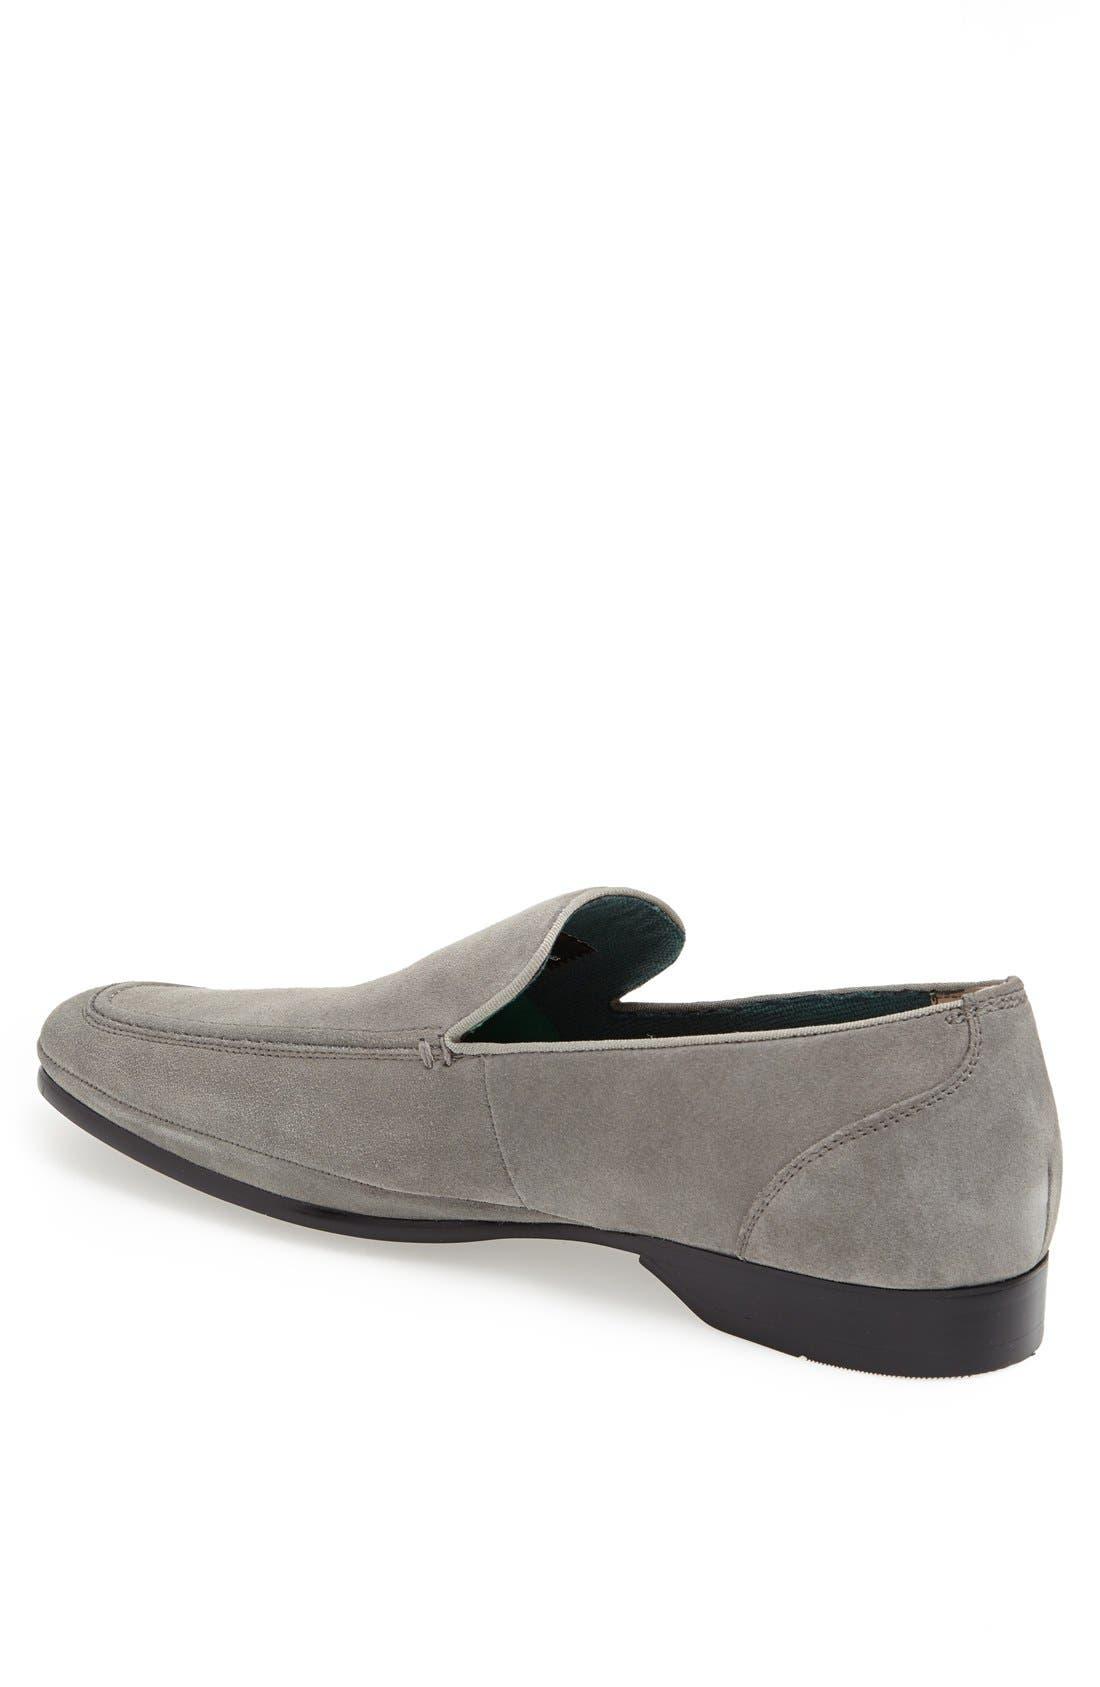 Alternate Image 2  - Florsheim 'Fluent' Suede Venetian Loafer